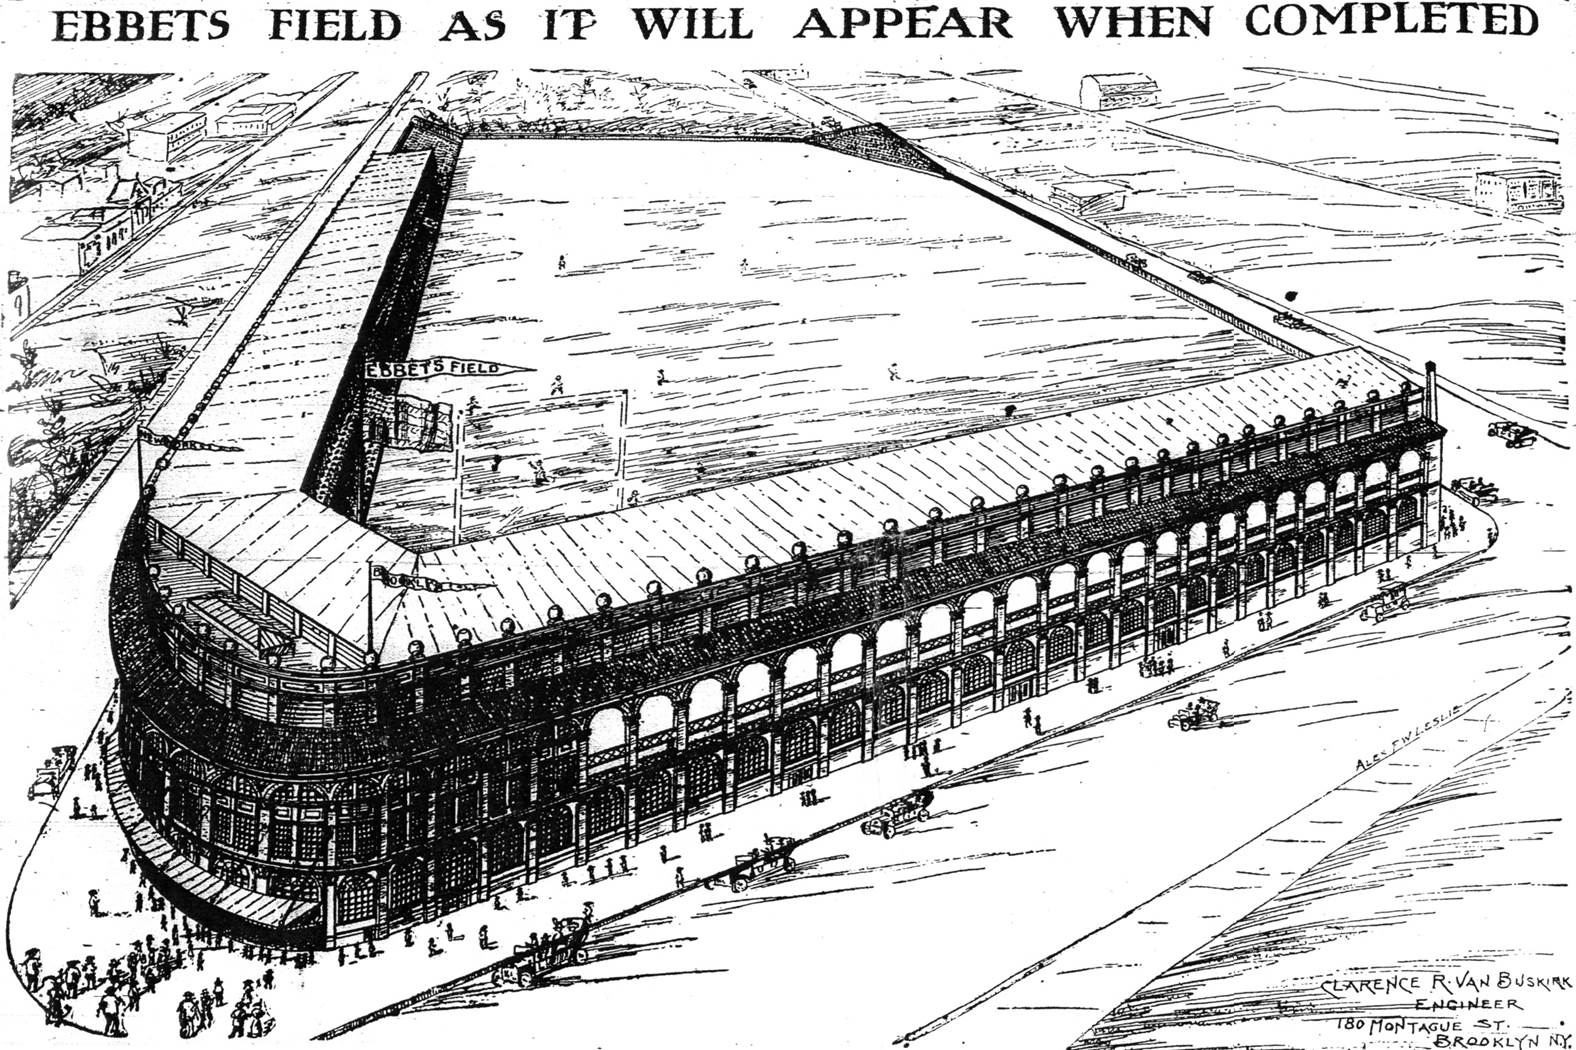 Brooklyn Daily Eagle, April 6, 1912